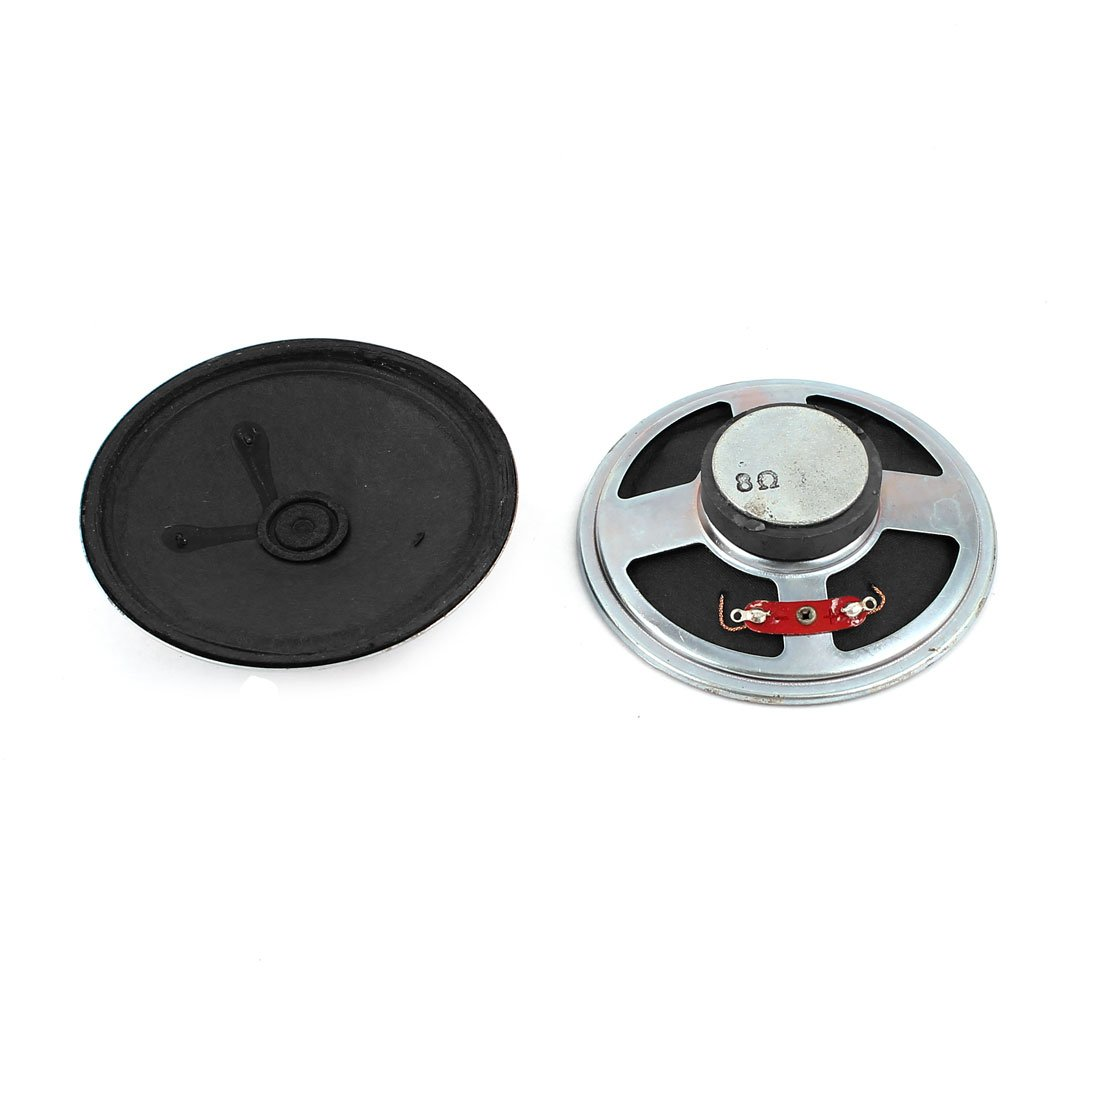 Paar 5W 8 Ohm 4-Pin JST-XH Stecker Notizbuch Tablet PC Magnet Lautsprecher